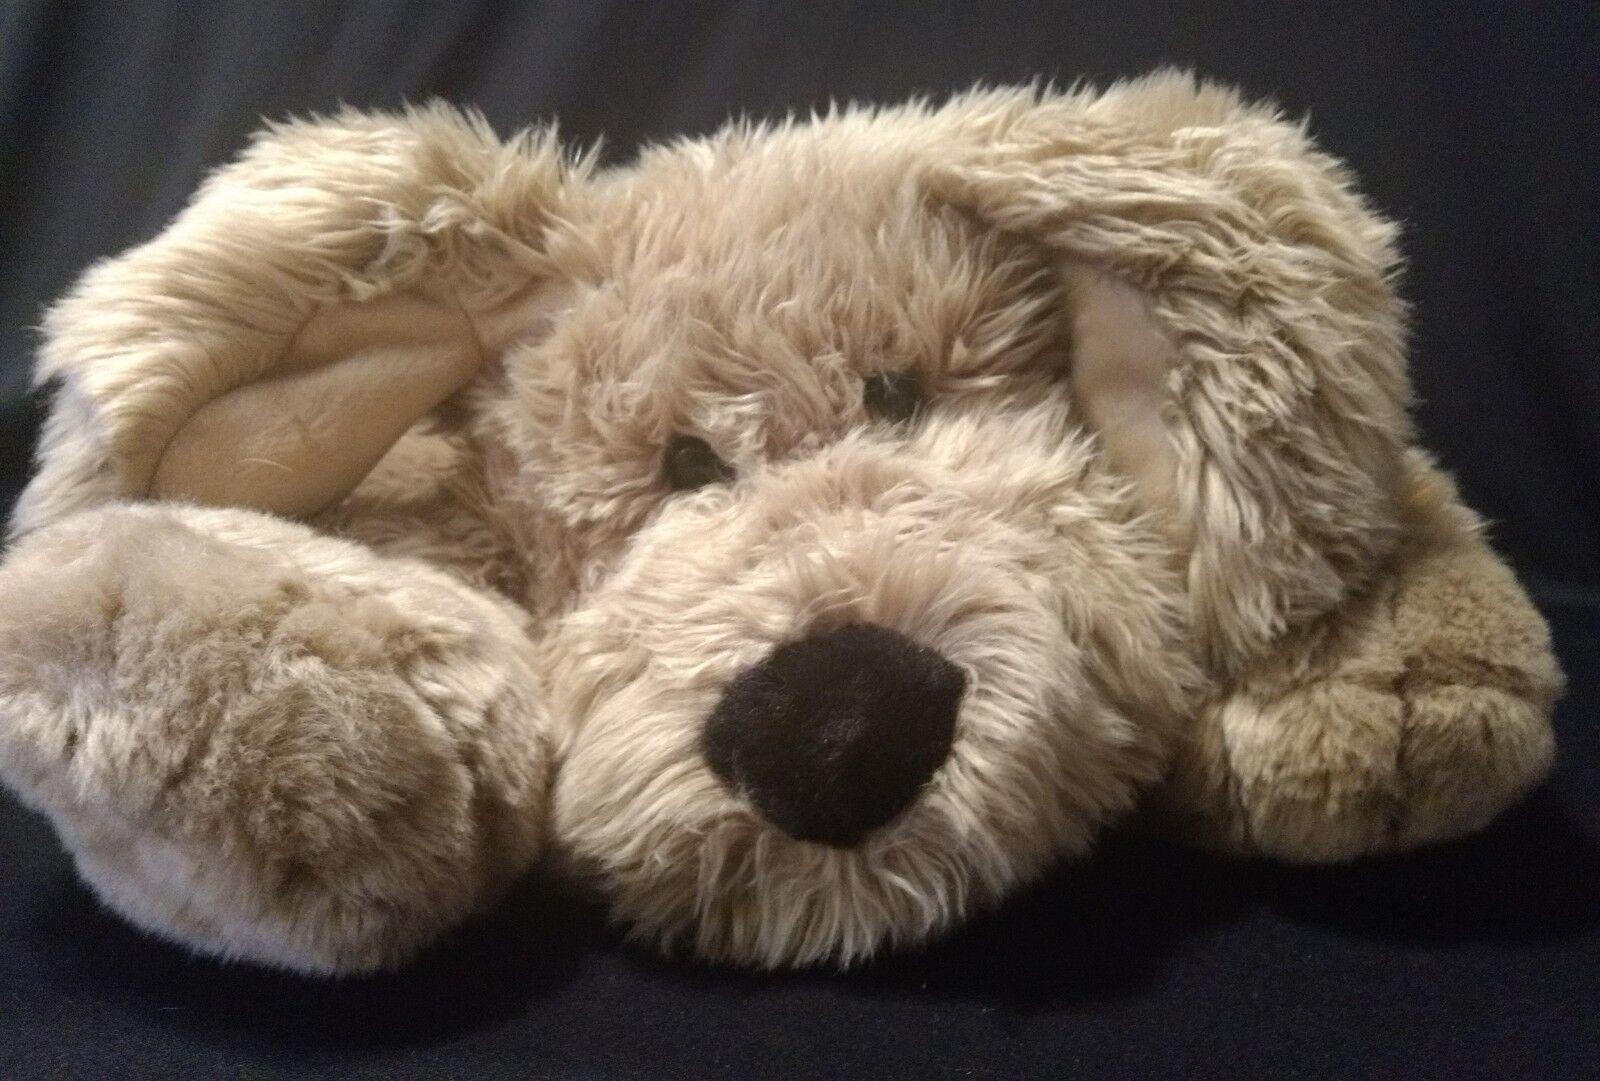 Vintage COMMONWEALTH PUPPY DOG Large Plush Stuffed Animal Pillow Toy 24